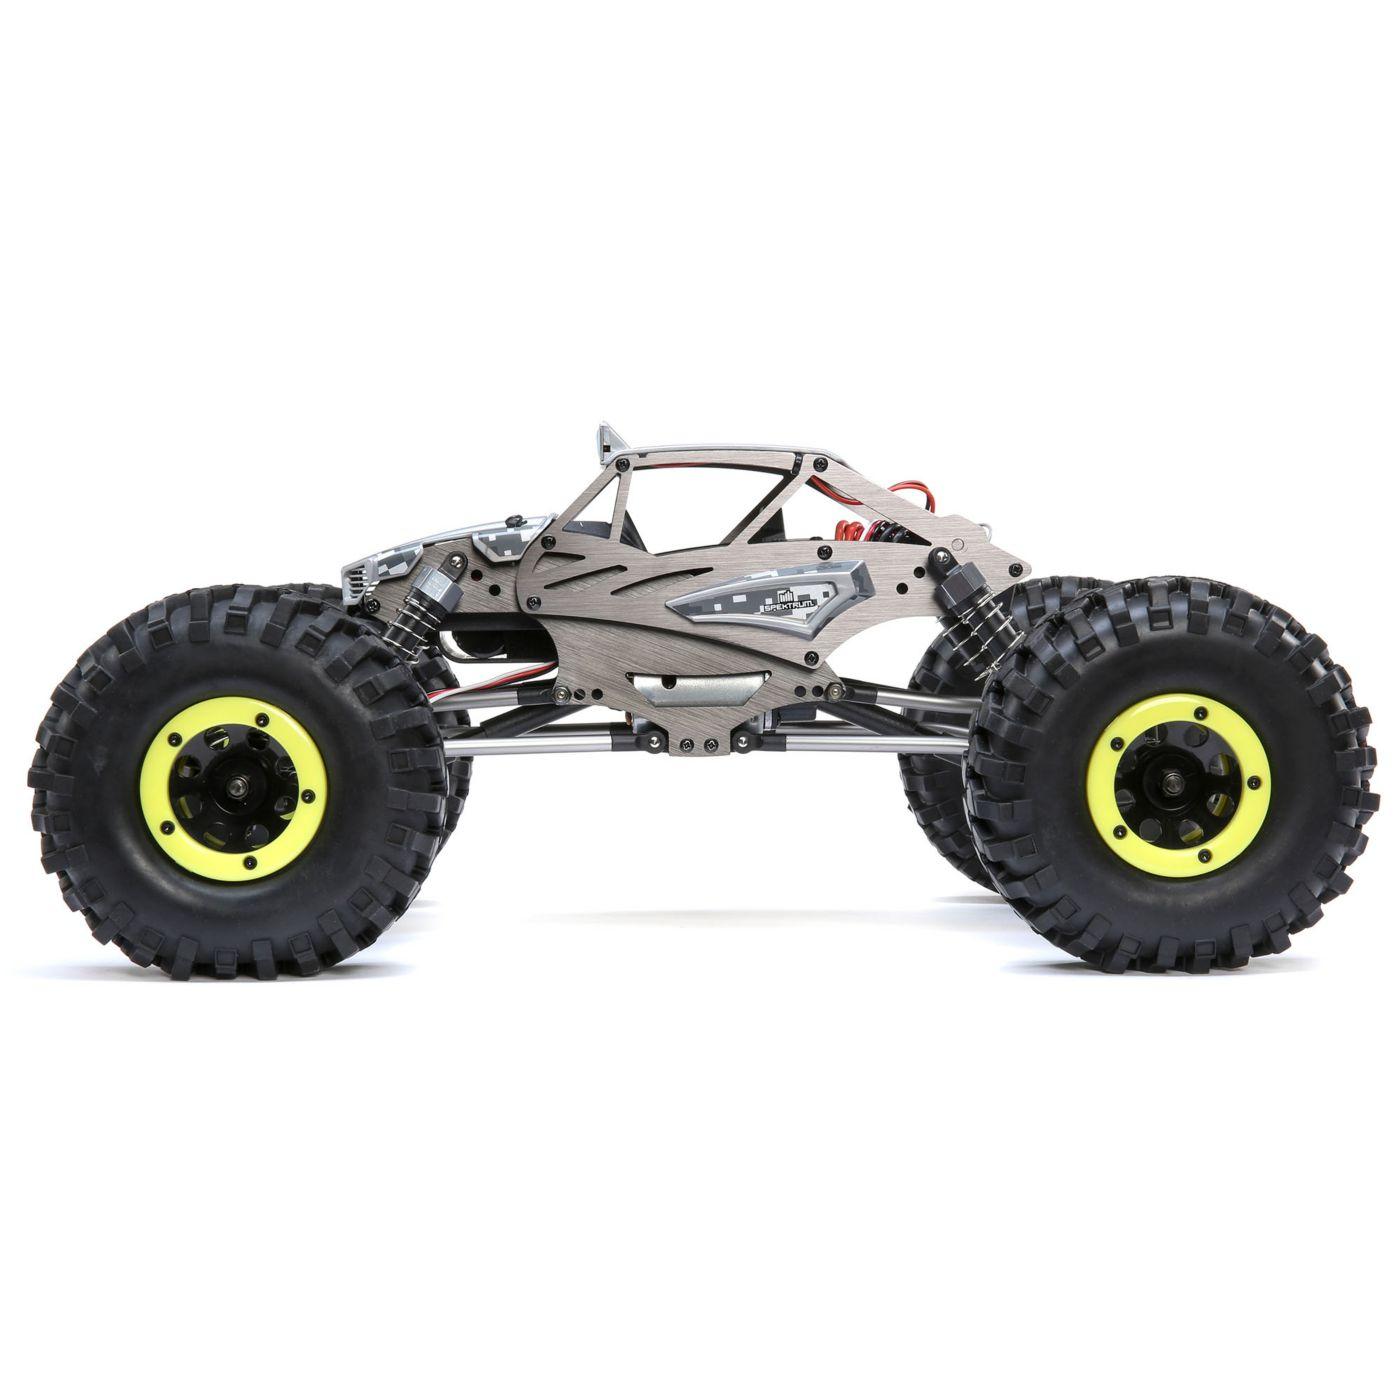 ECX Temper 1-18 GEN2 RC Crawler - Side